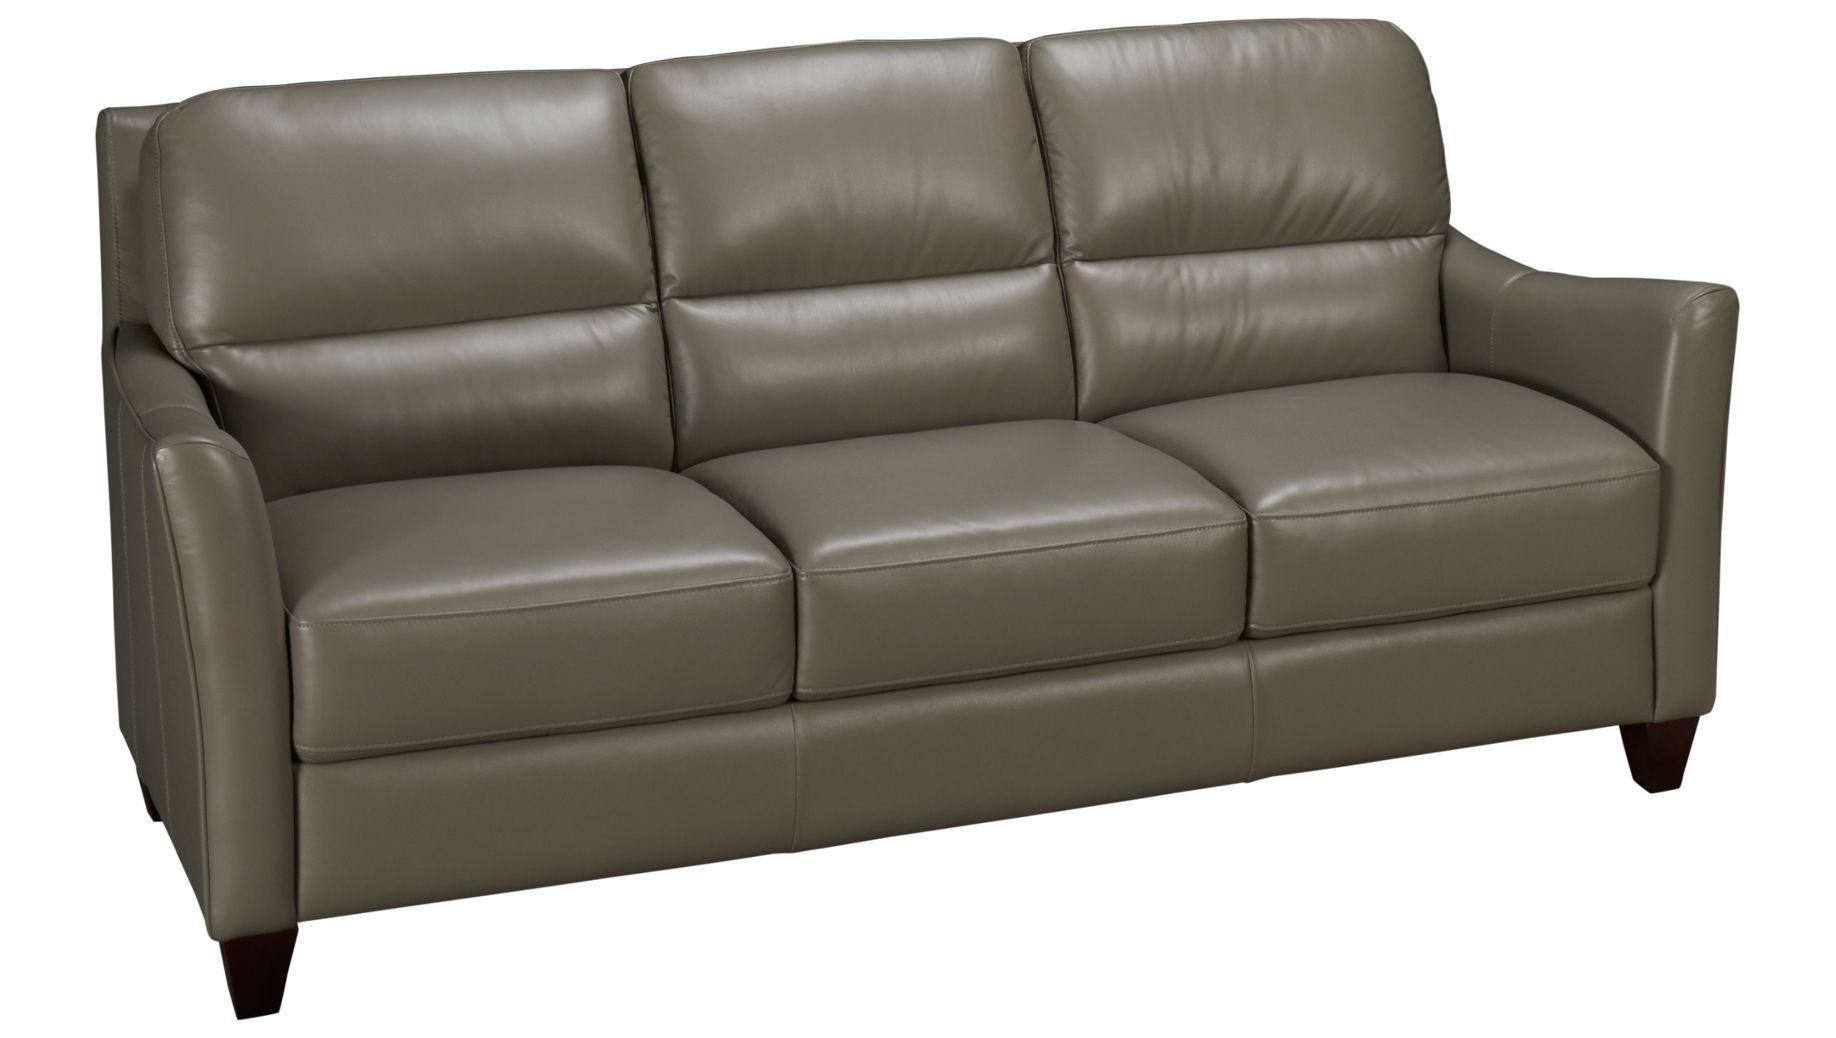 - Futura Leather-Bermuda-Bermuda Leather Sofa - Jordan's Furniture